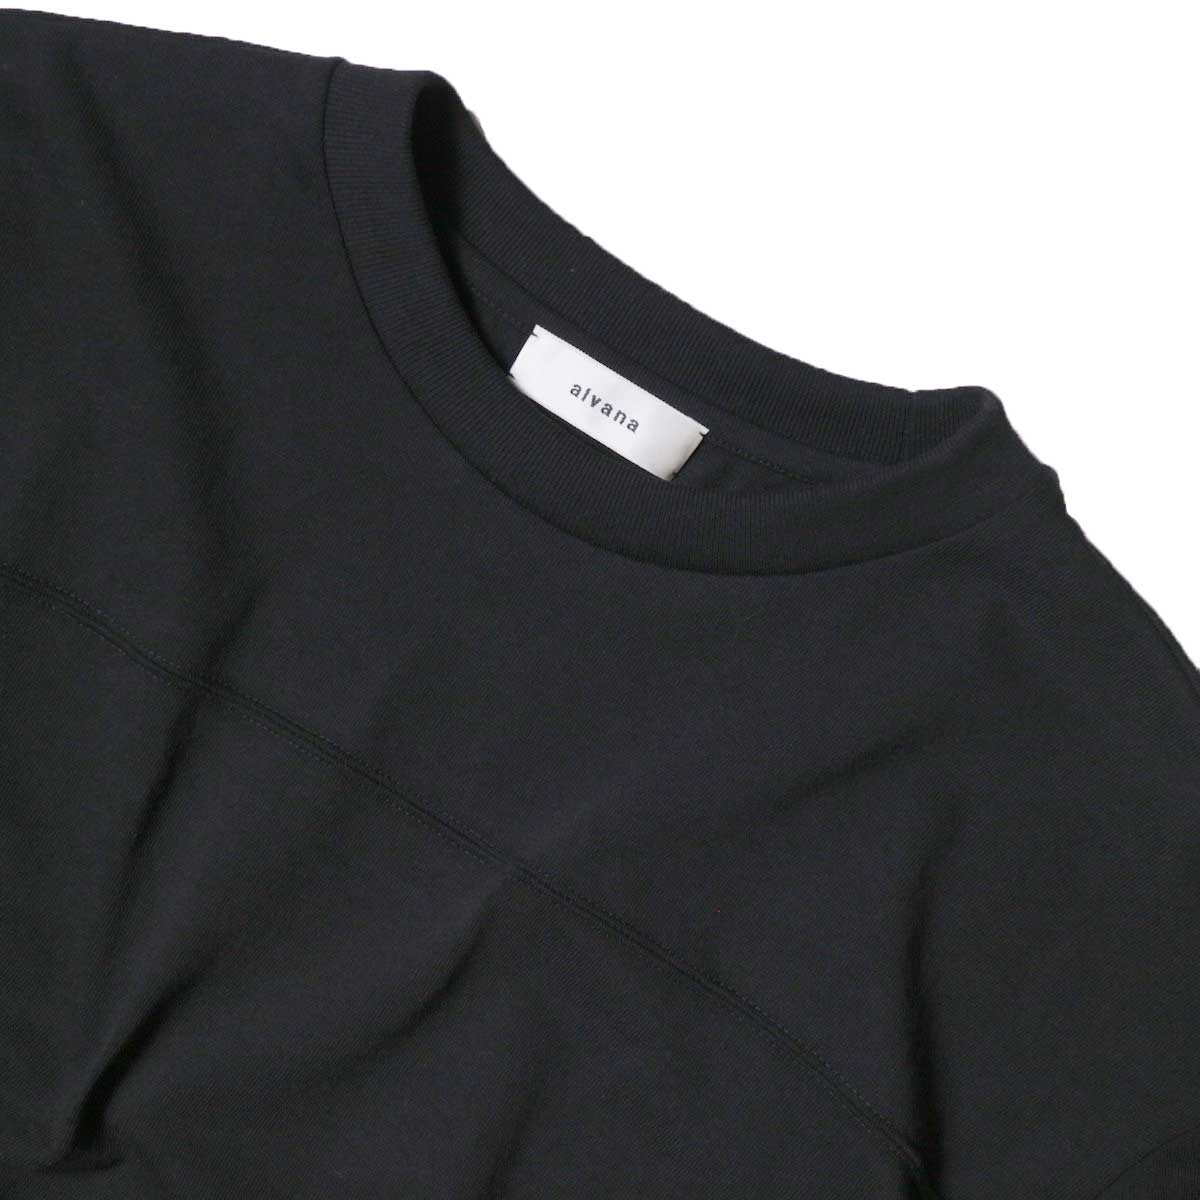 alvana / Protect Football S/S Tee (Black)ネック